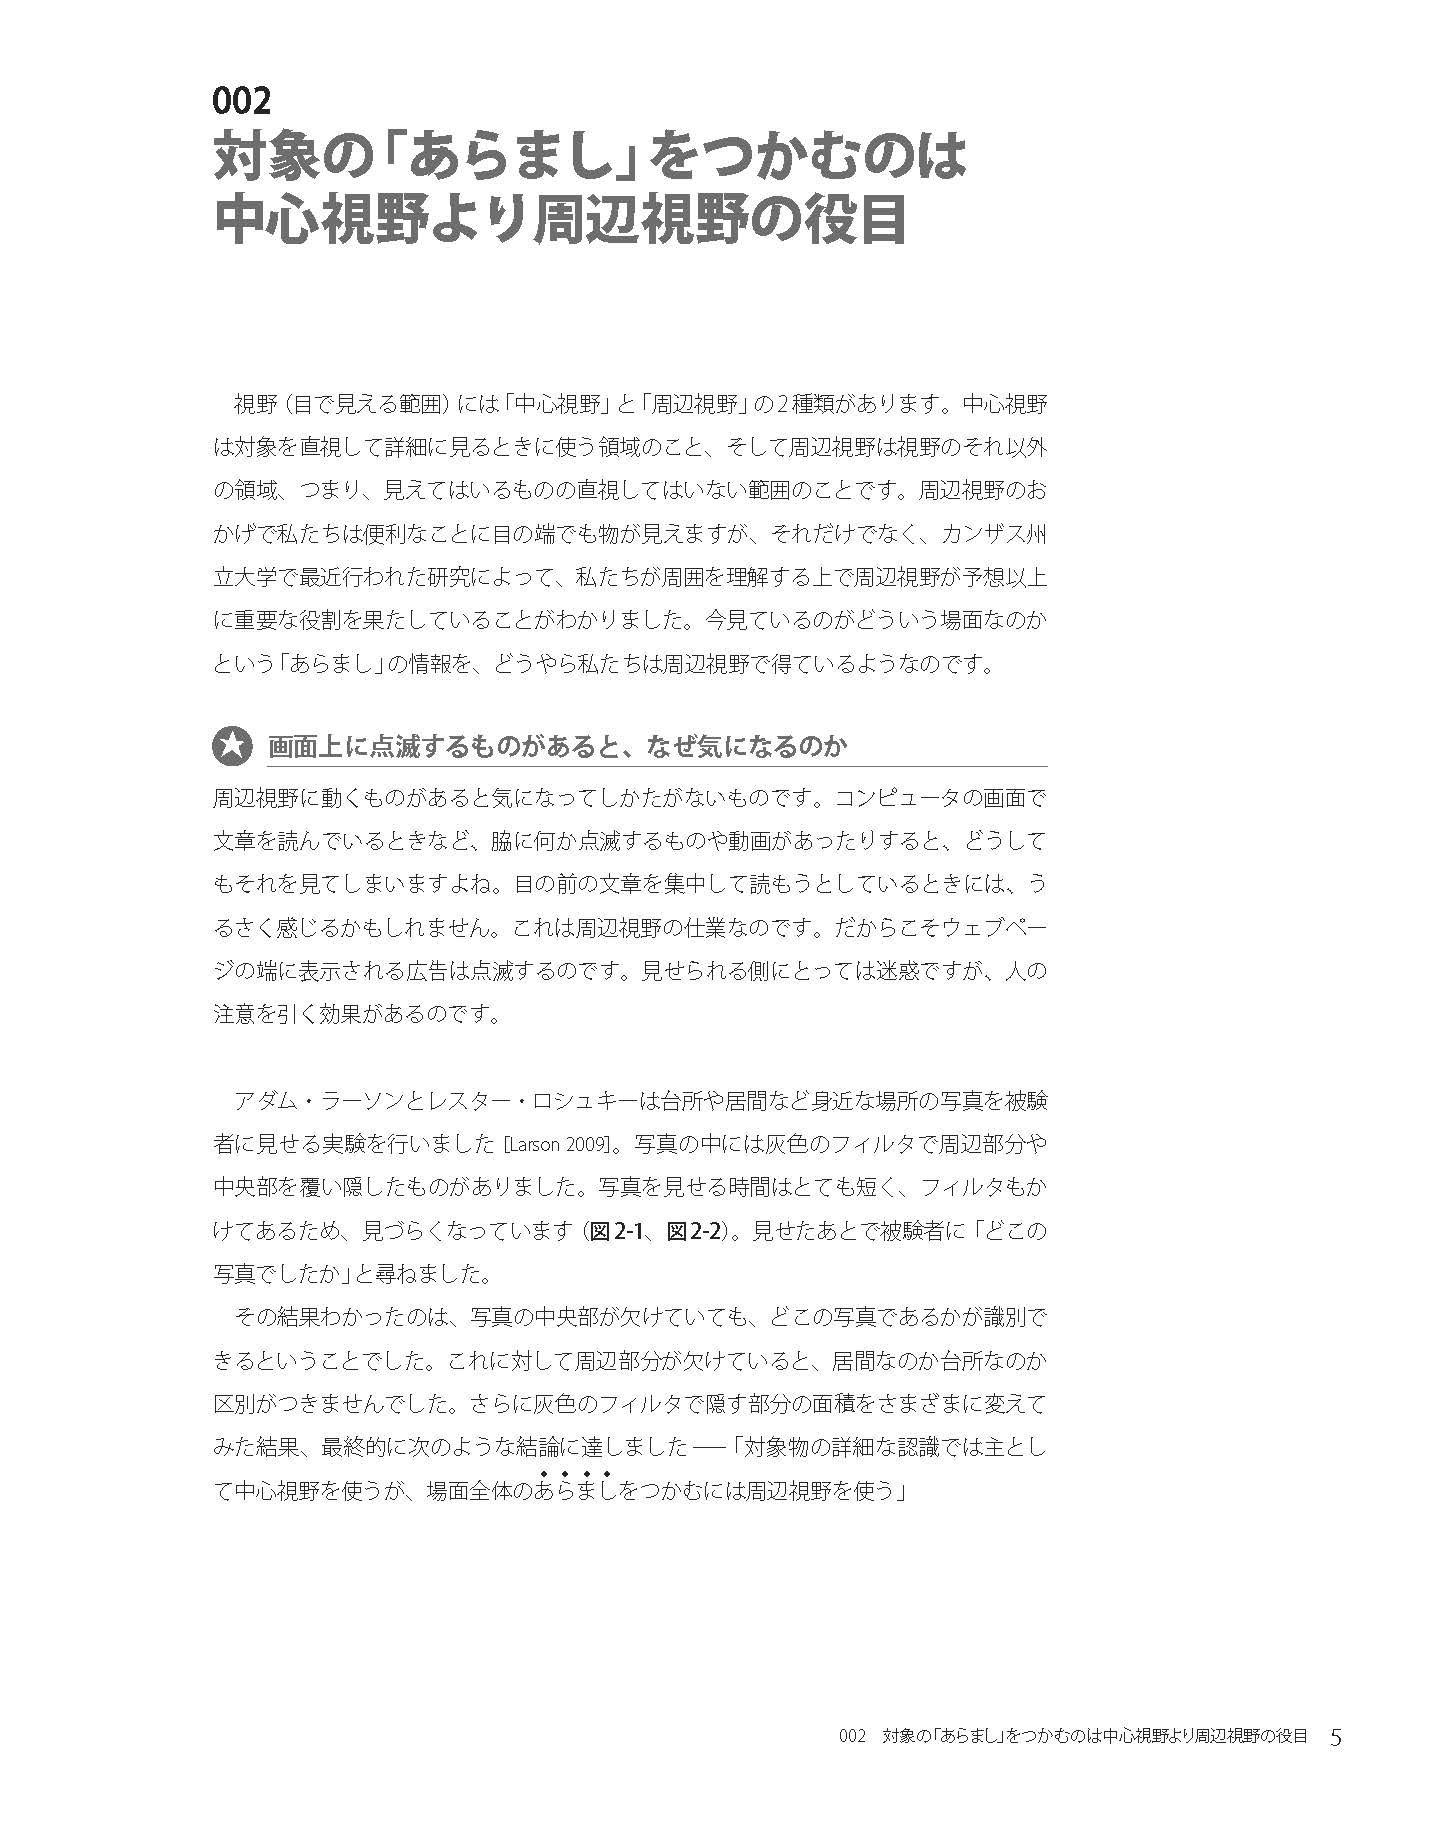 https://images-na.ssl-images-amazon.com/images/I/81GGExbLrGL.jpg